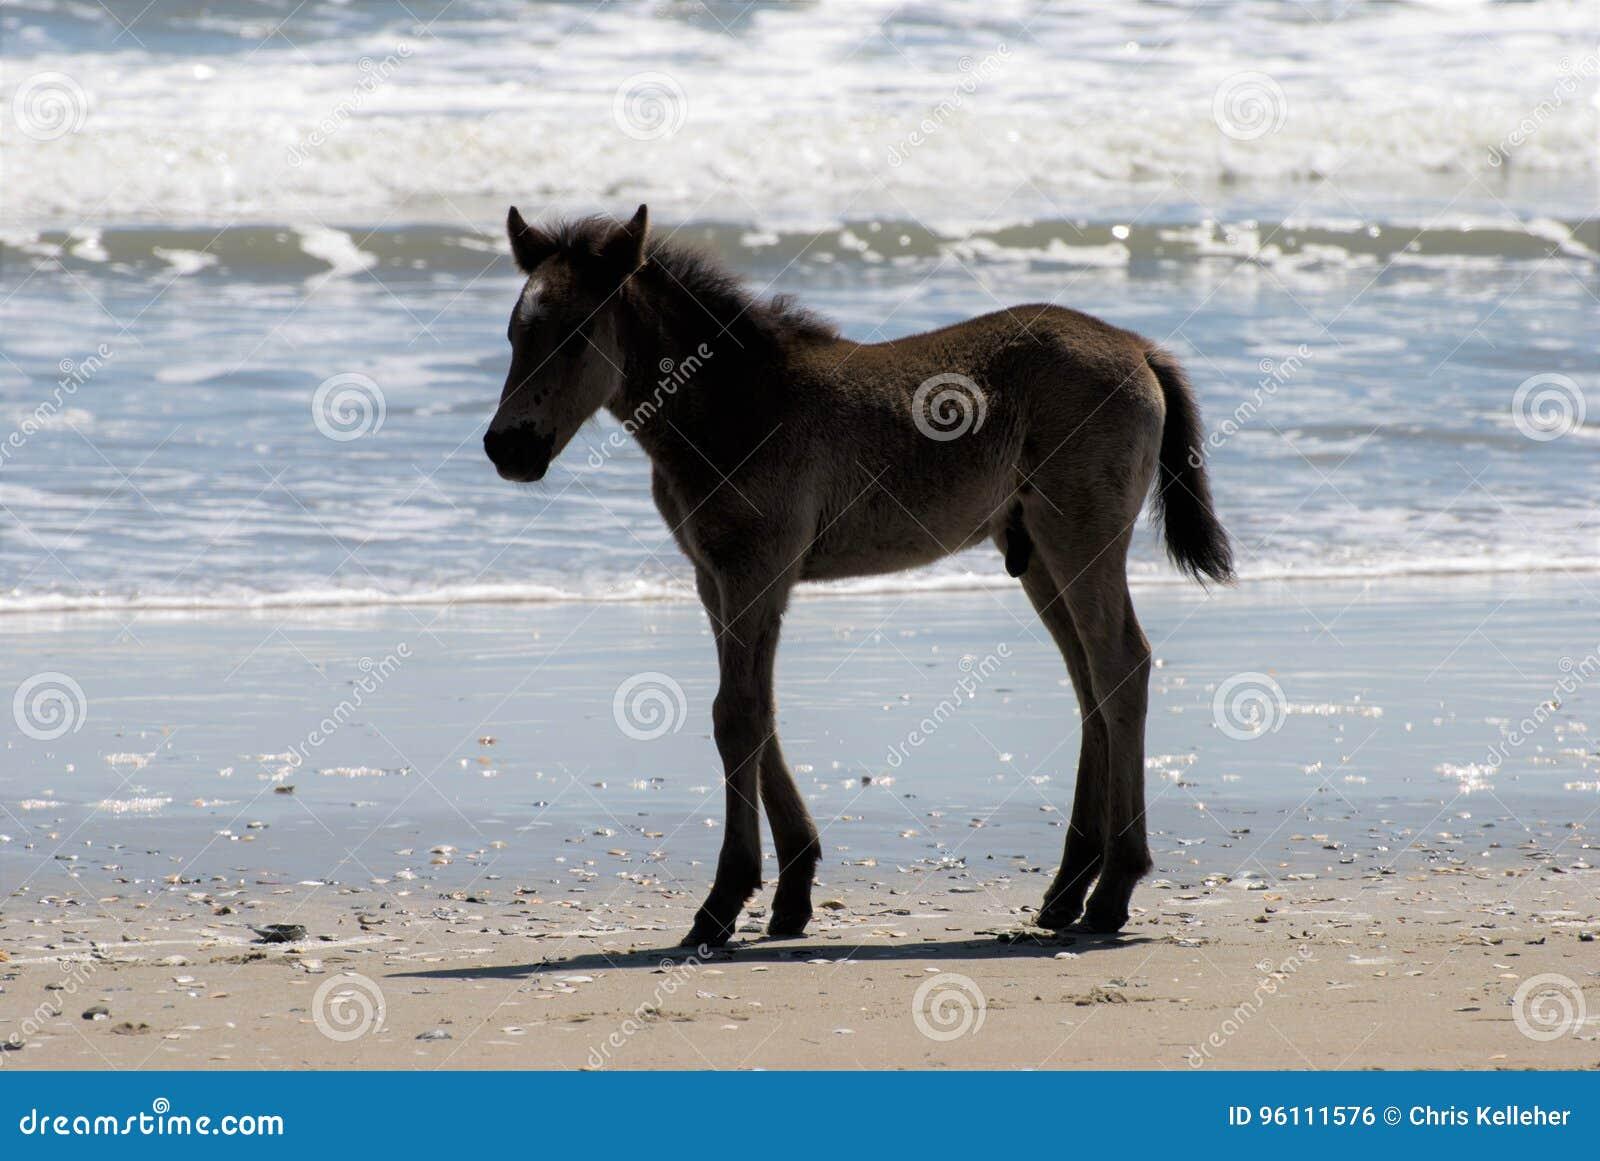 Wild horses walking along the beach in Corolla, North Carolina